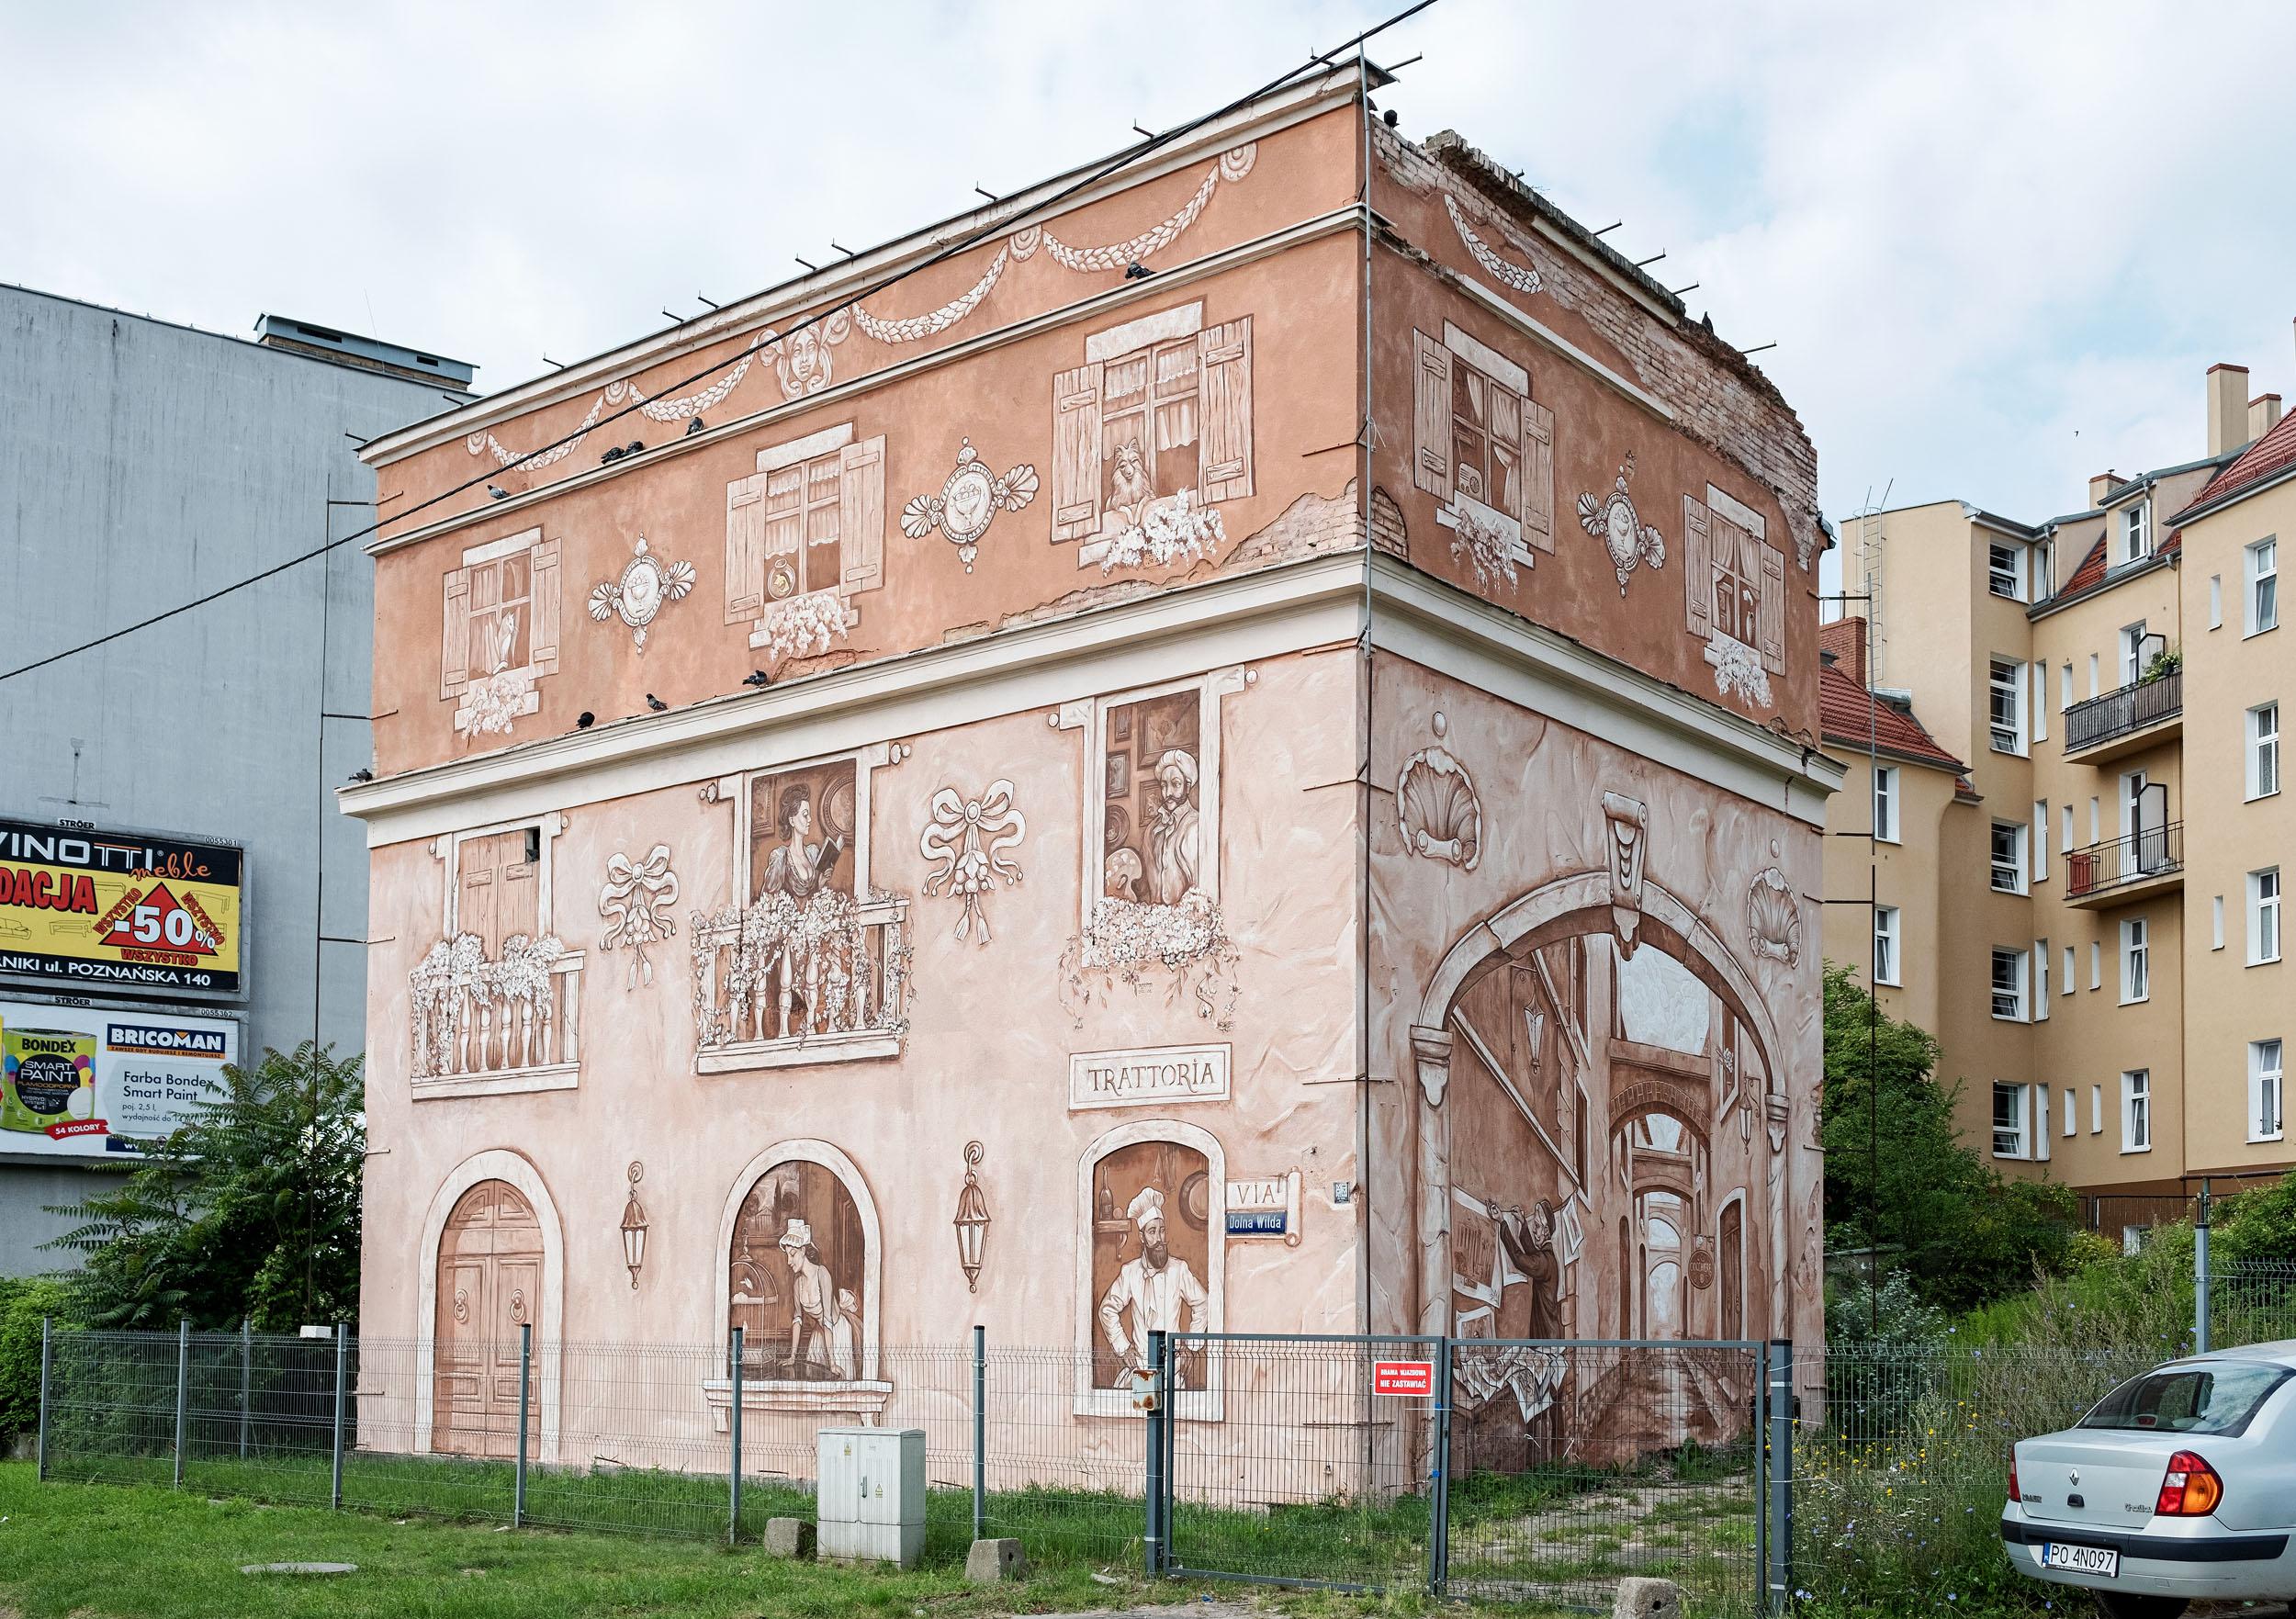 Neighbors โปรเจ็กต์ศิลปะในโปแลนด์ เปลี่ยนผนังบ้านร้างสร้างสัมพันธ์ฉันท์เพื่อน